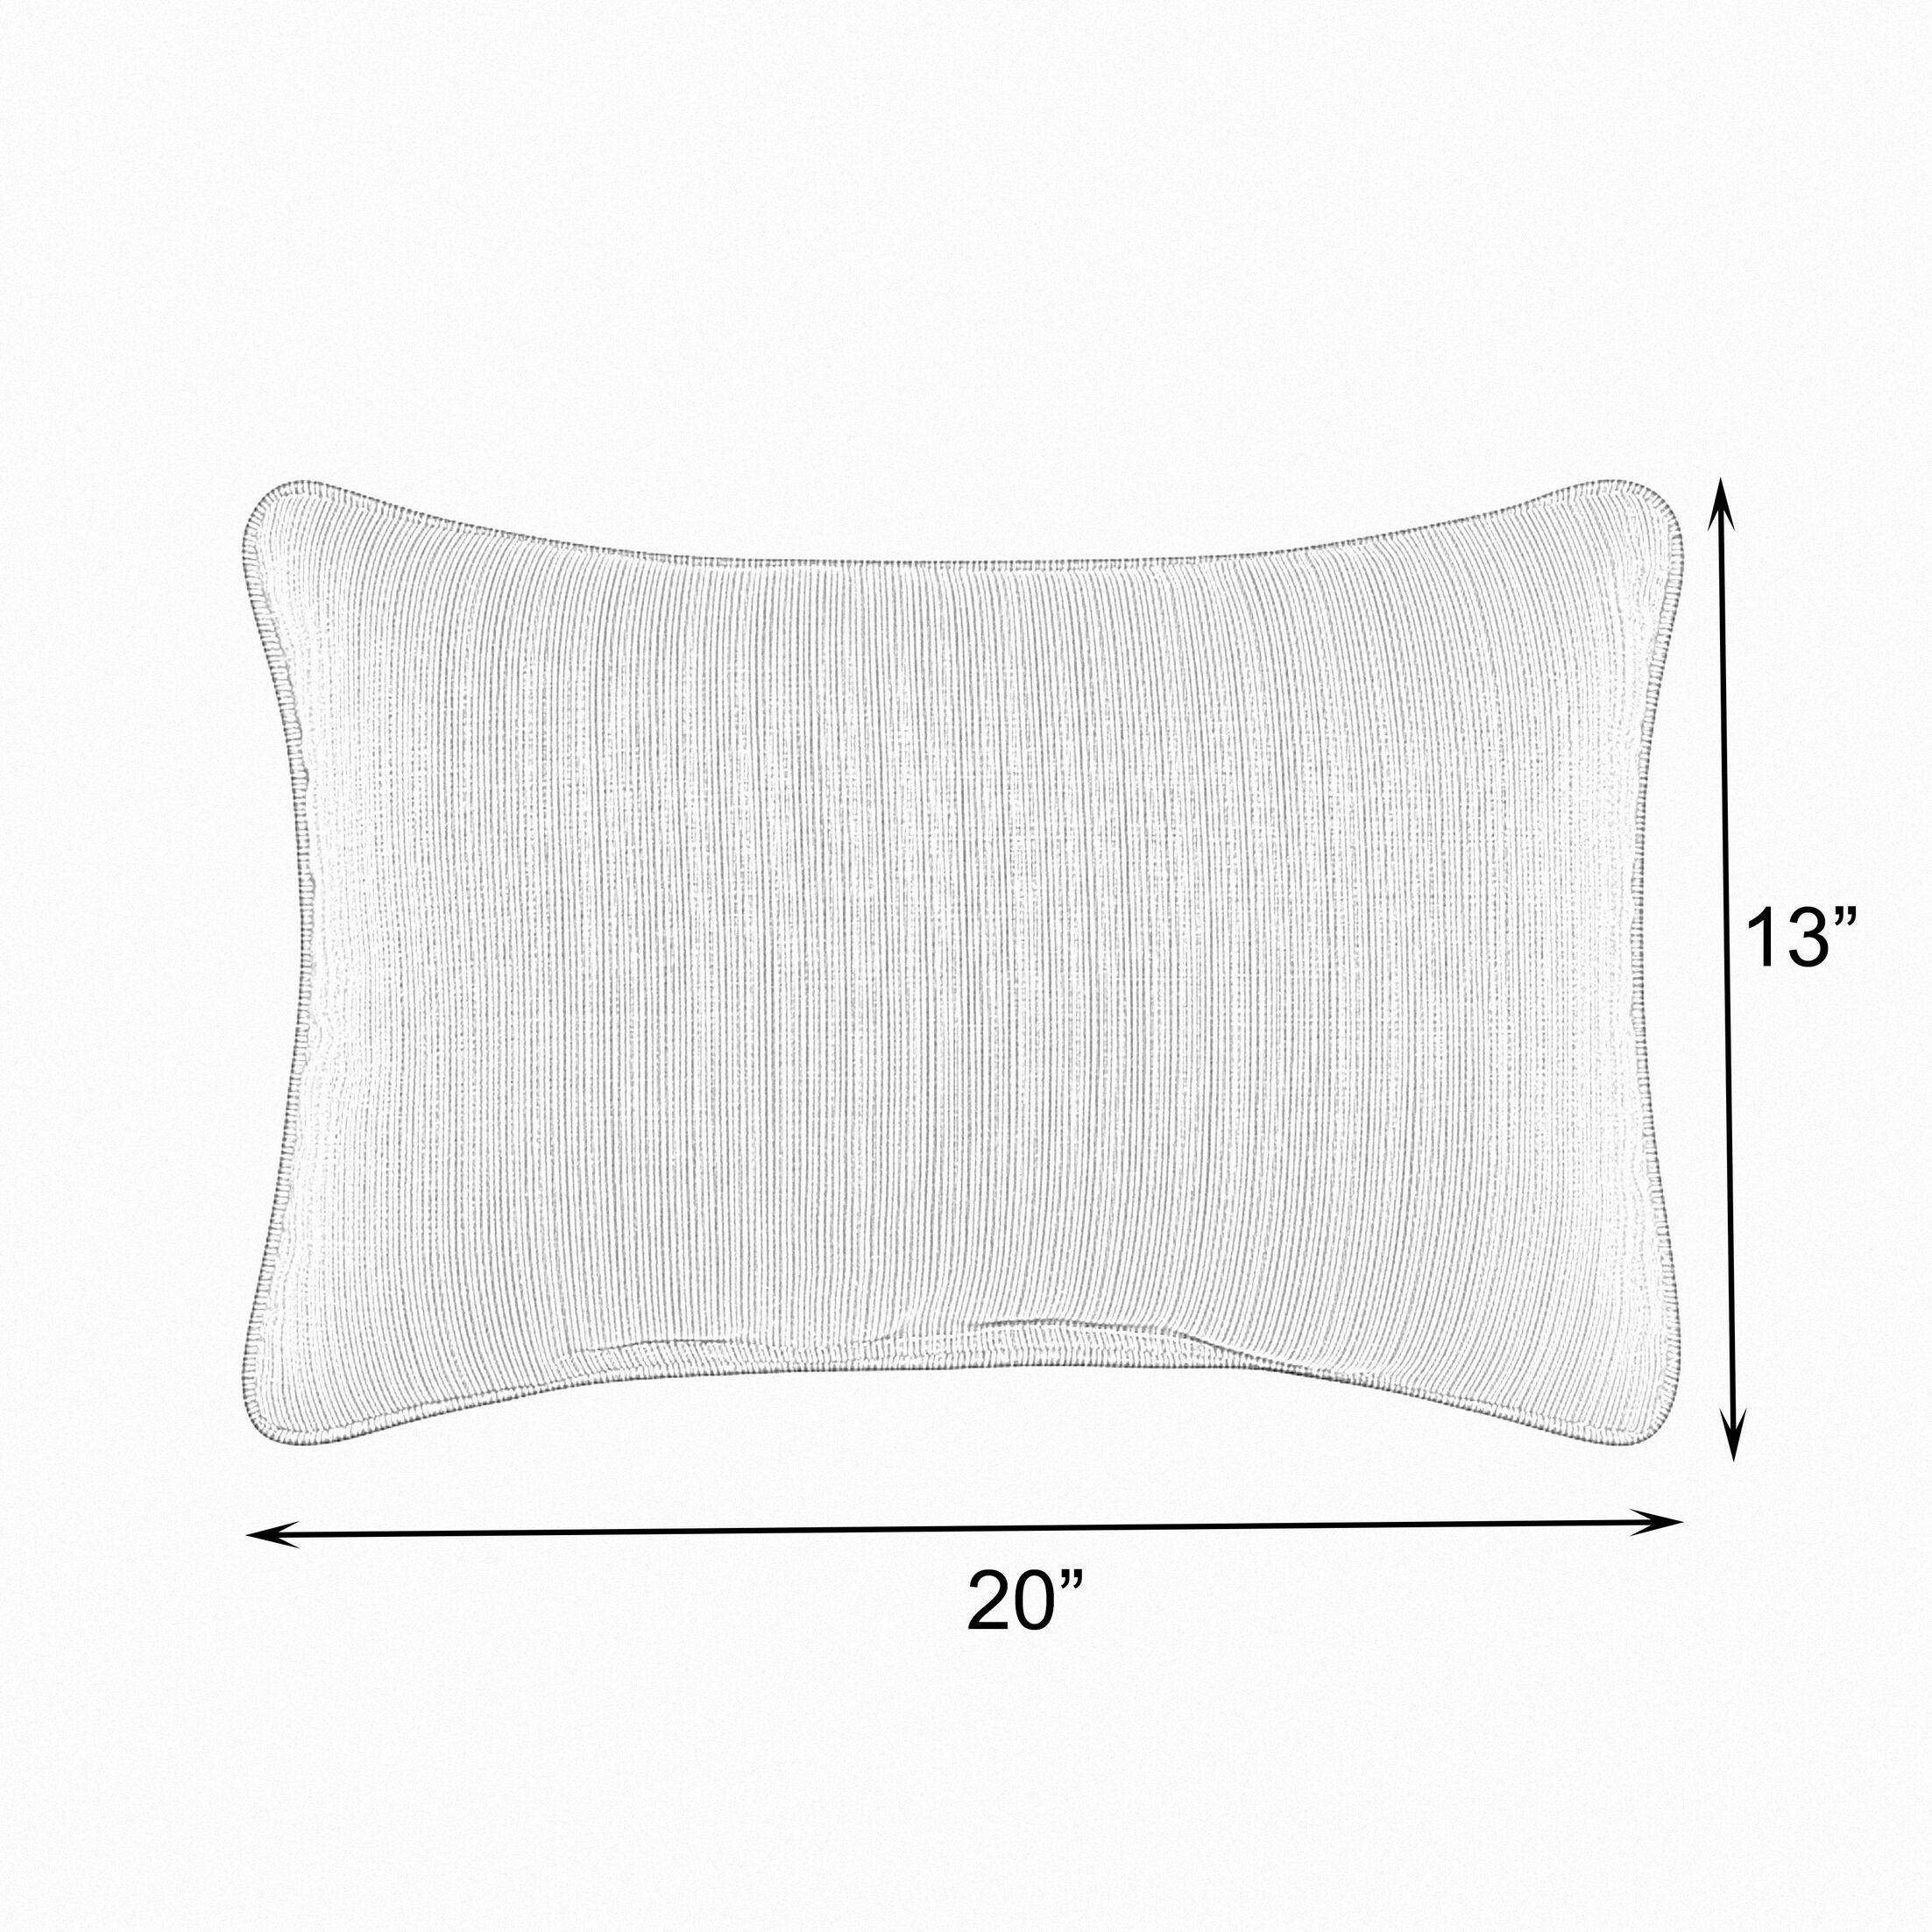 Cox Sunbrella Peyton Granite Outdoor Lumbar Pillow Size: 13